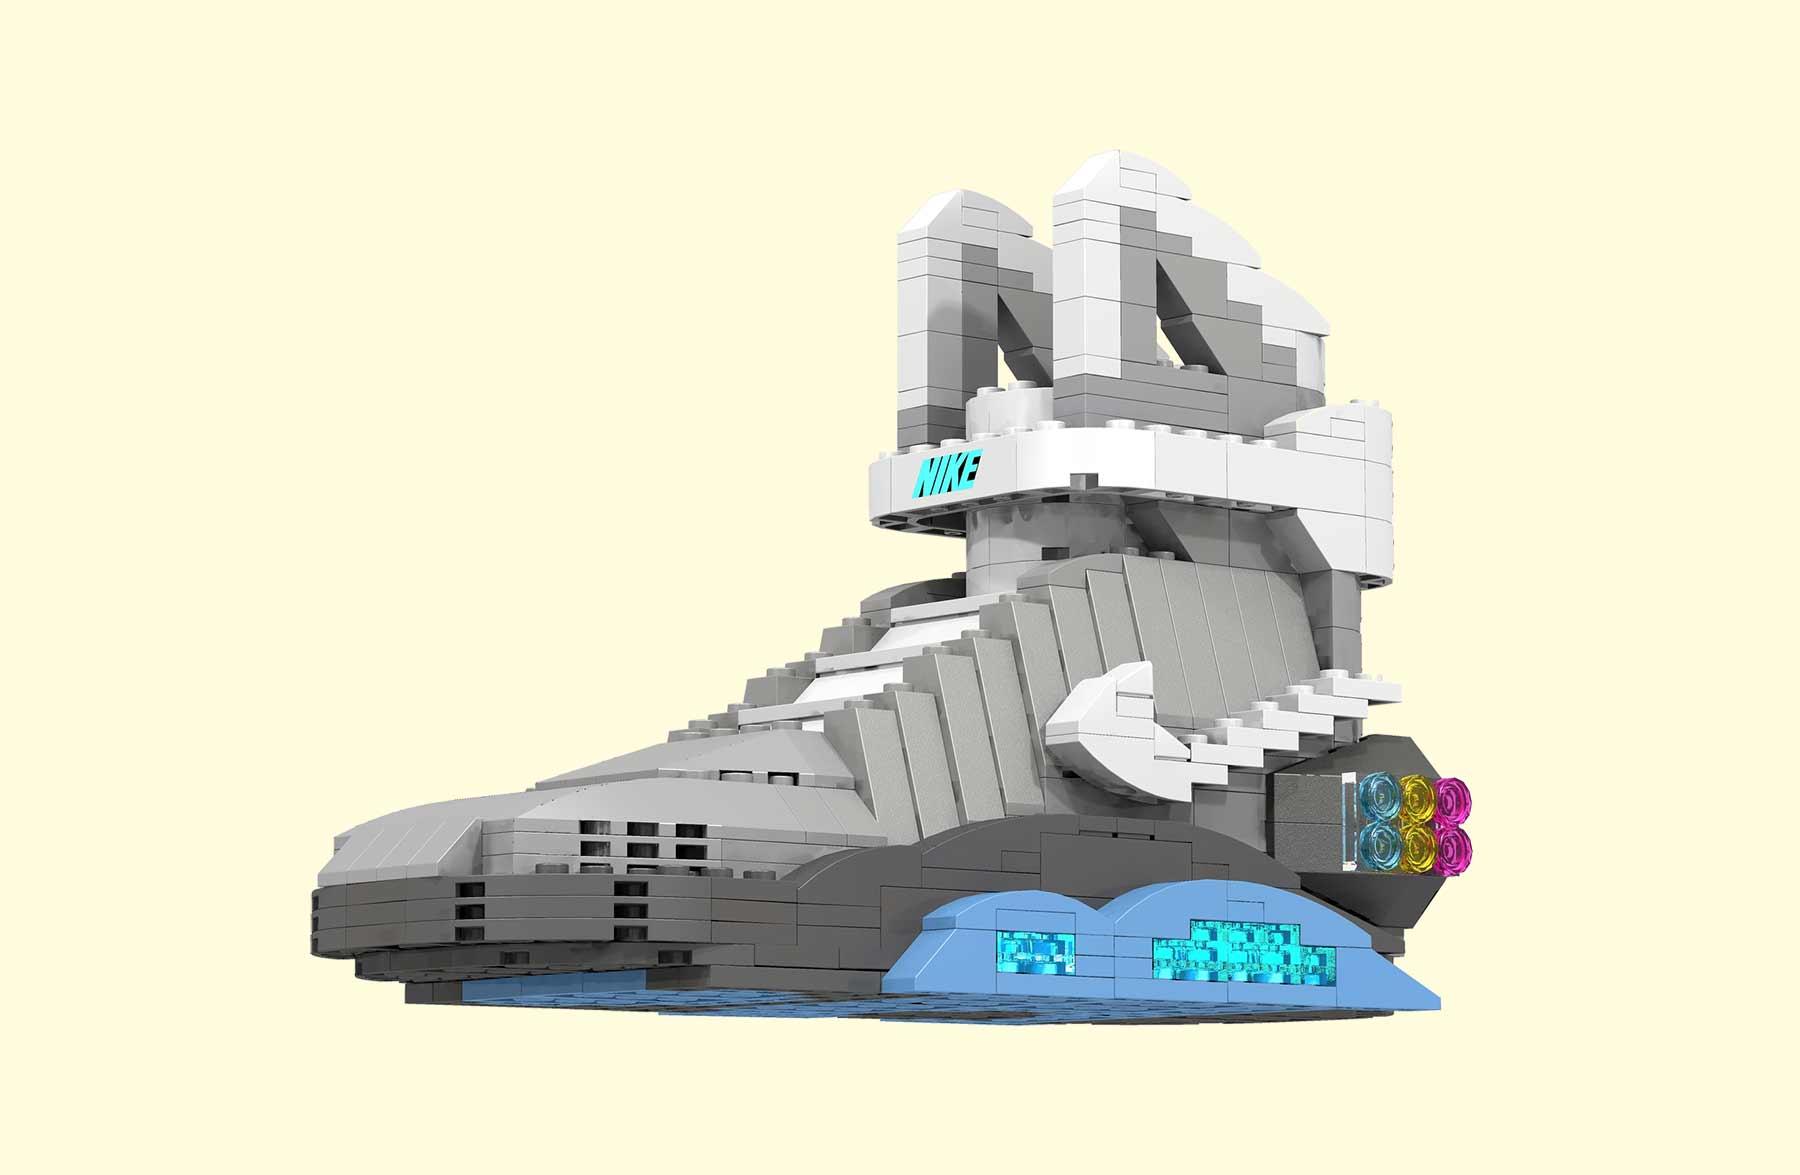 LEGO-Sneaker von Tom Yoo